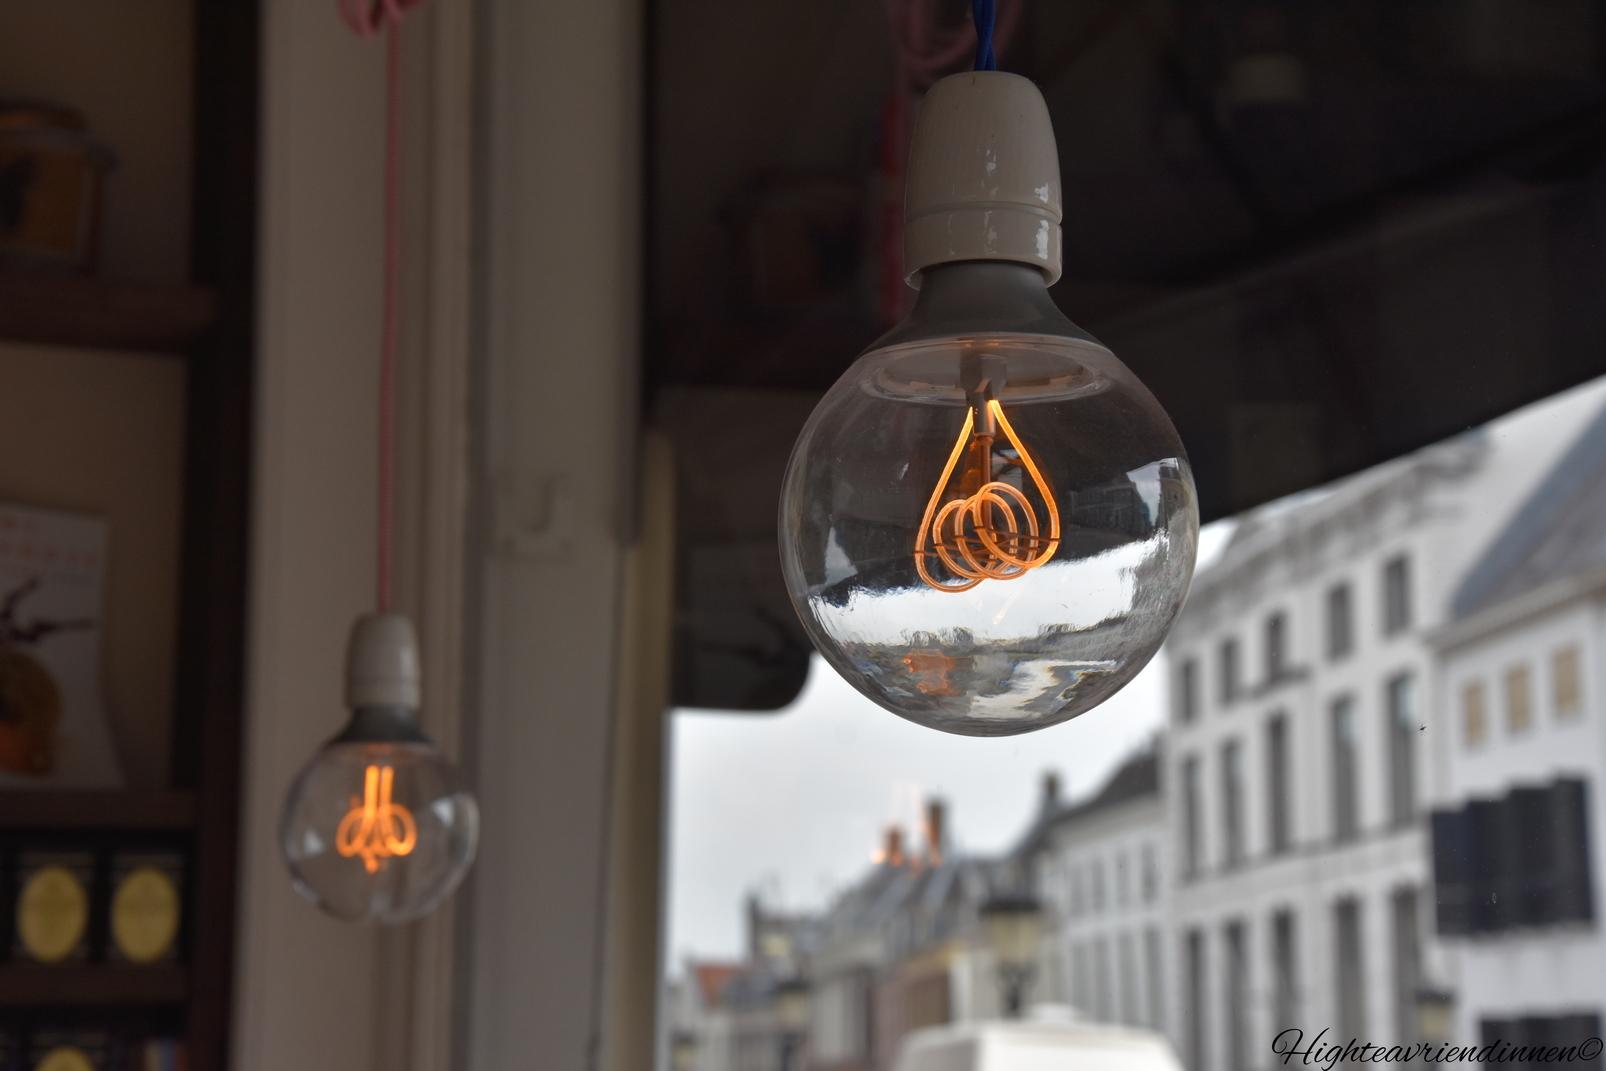 De Ontdekking Utrecht, high tea vriendinnen,